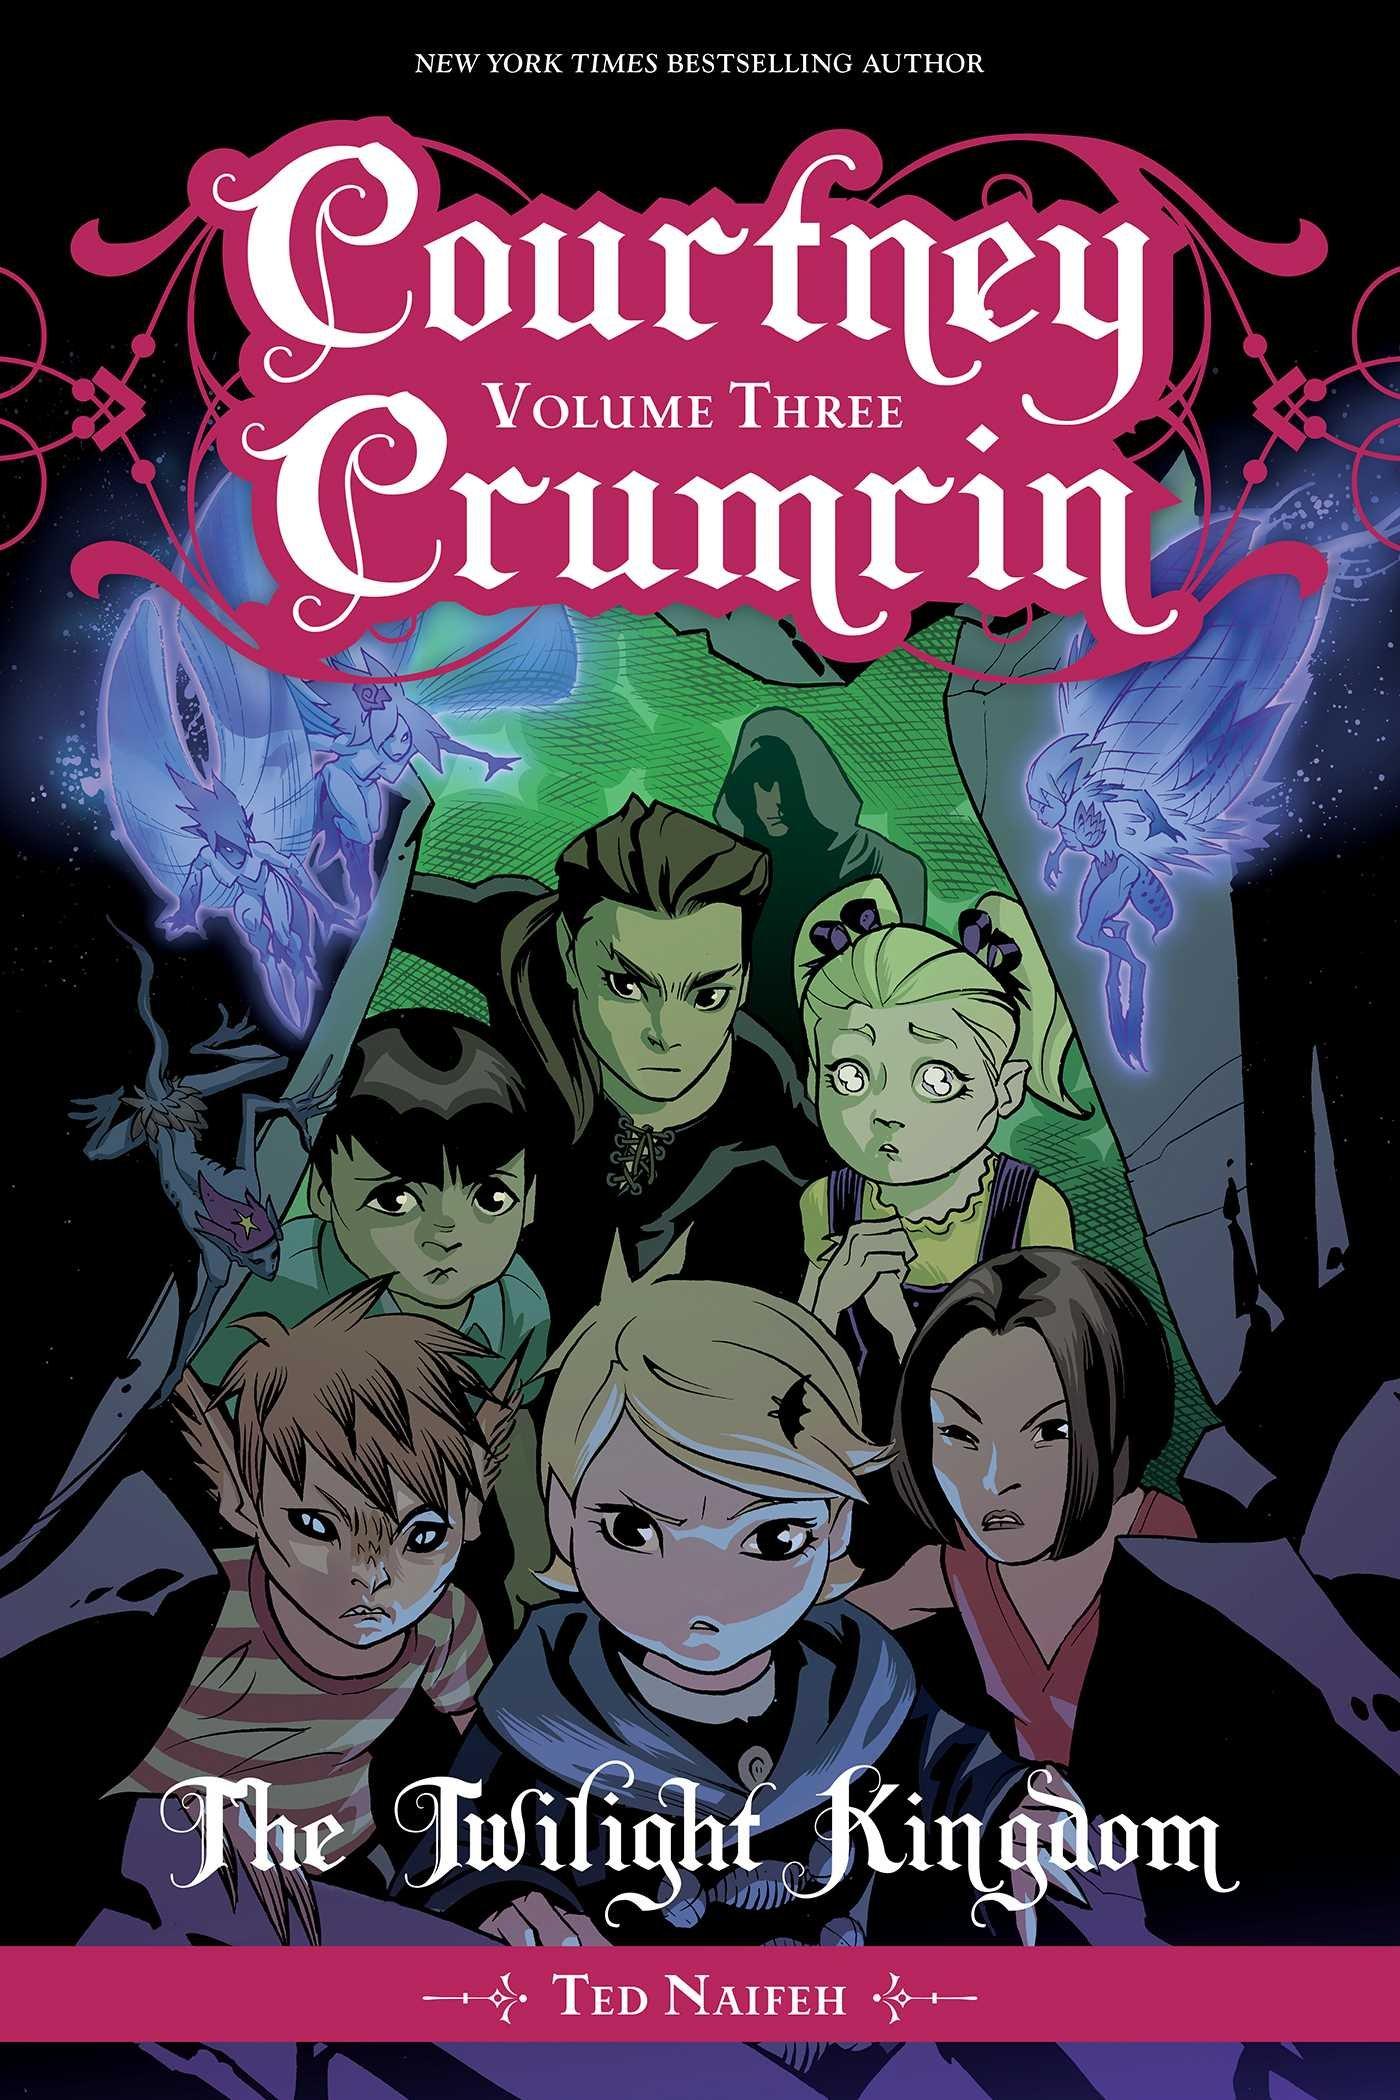 Courtney Crumrin Vol. 3: The Twilight Kingdom pdf epub